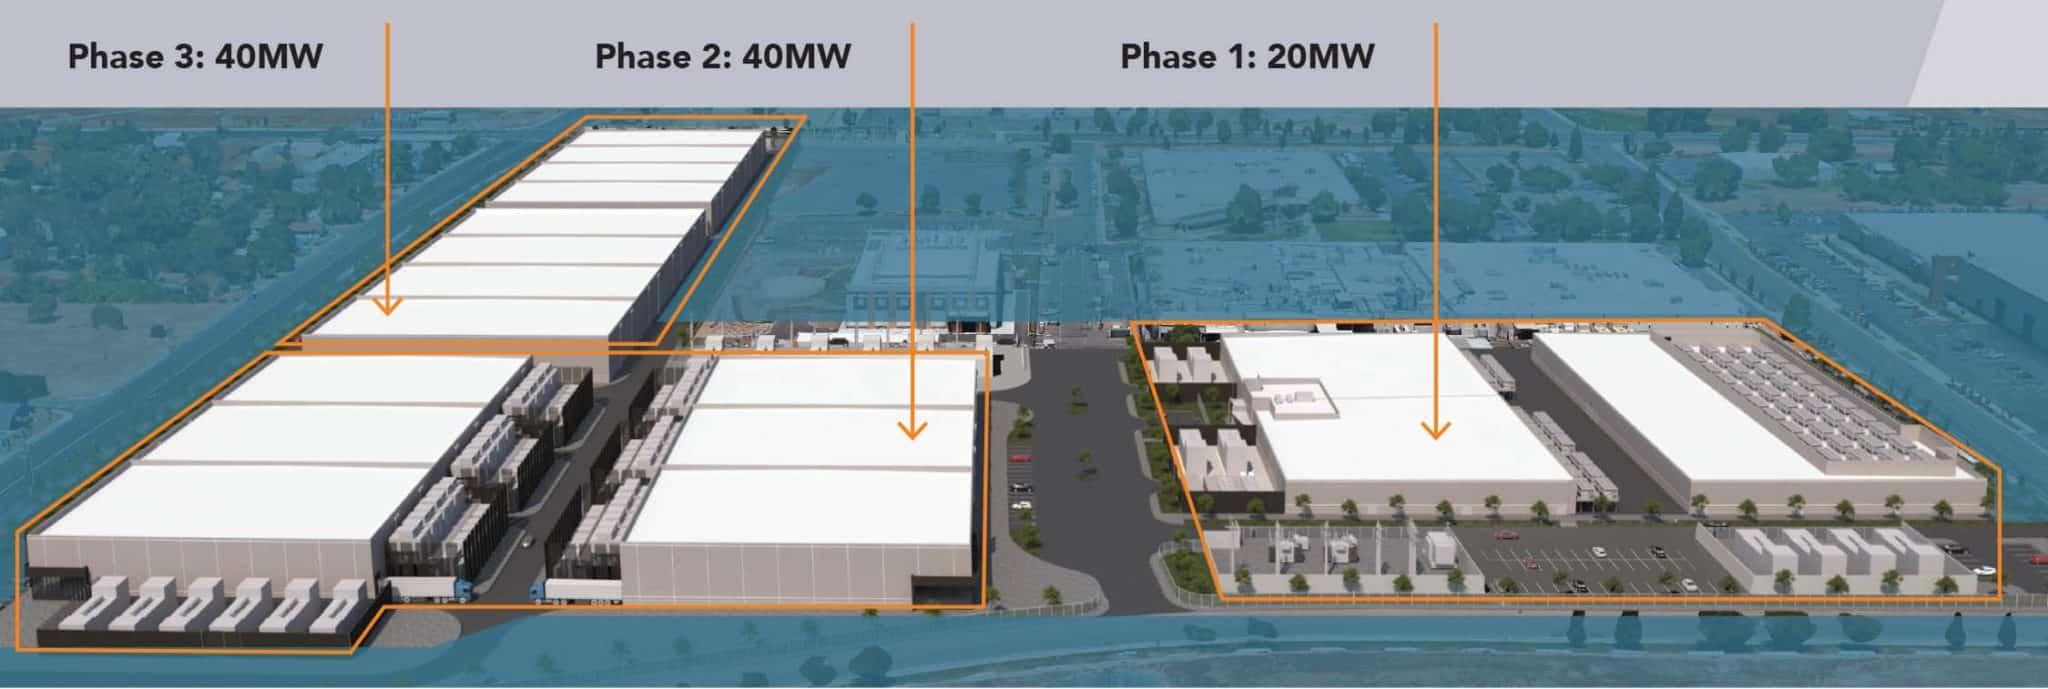 sacramento data center real estate development phases